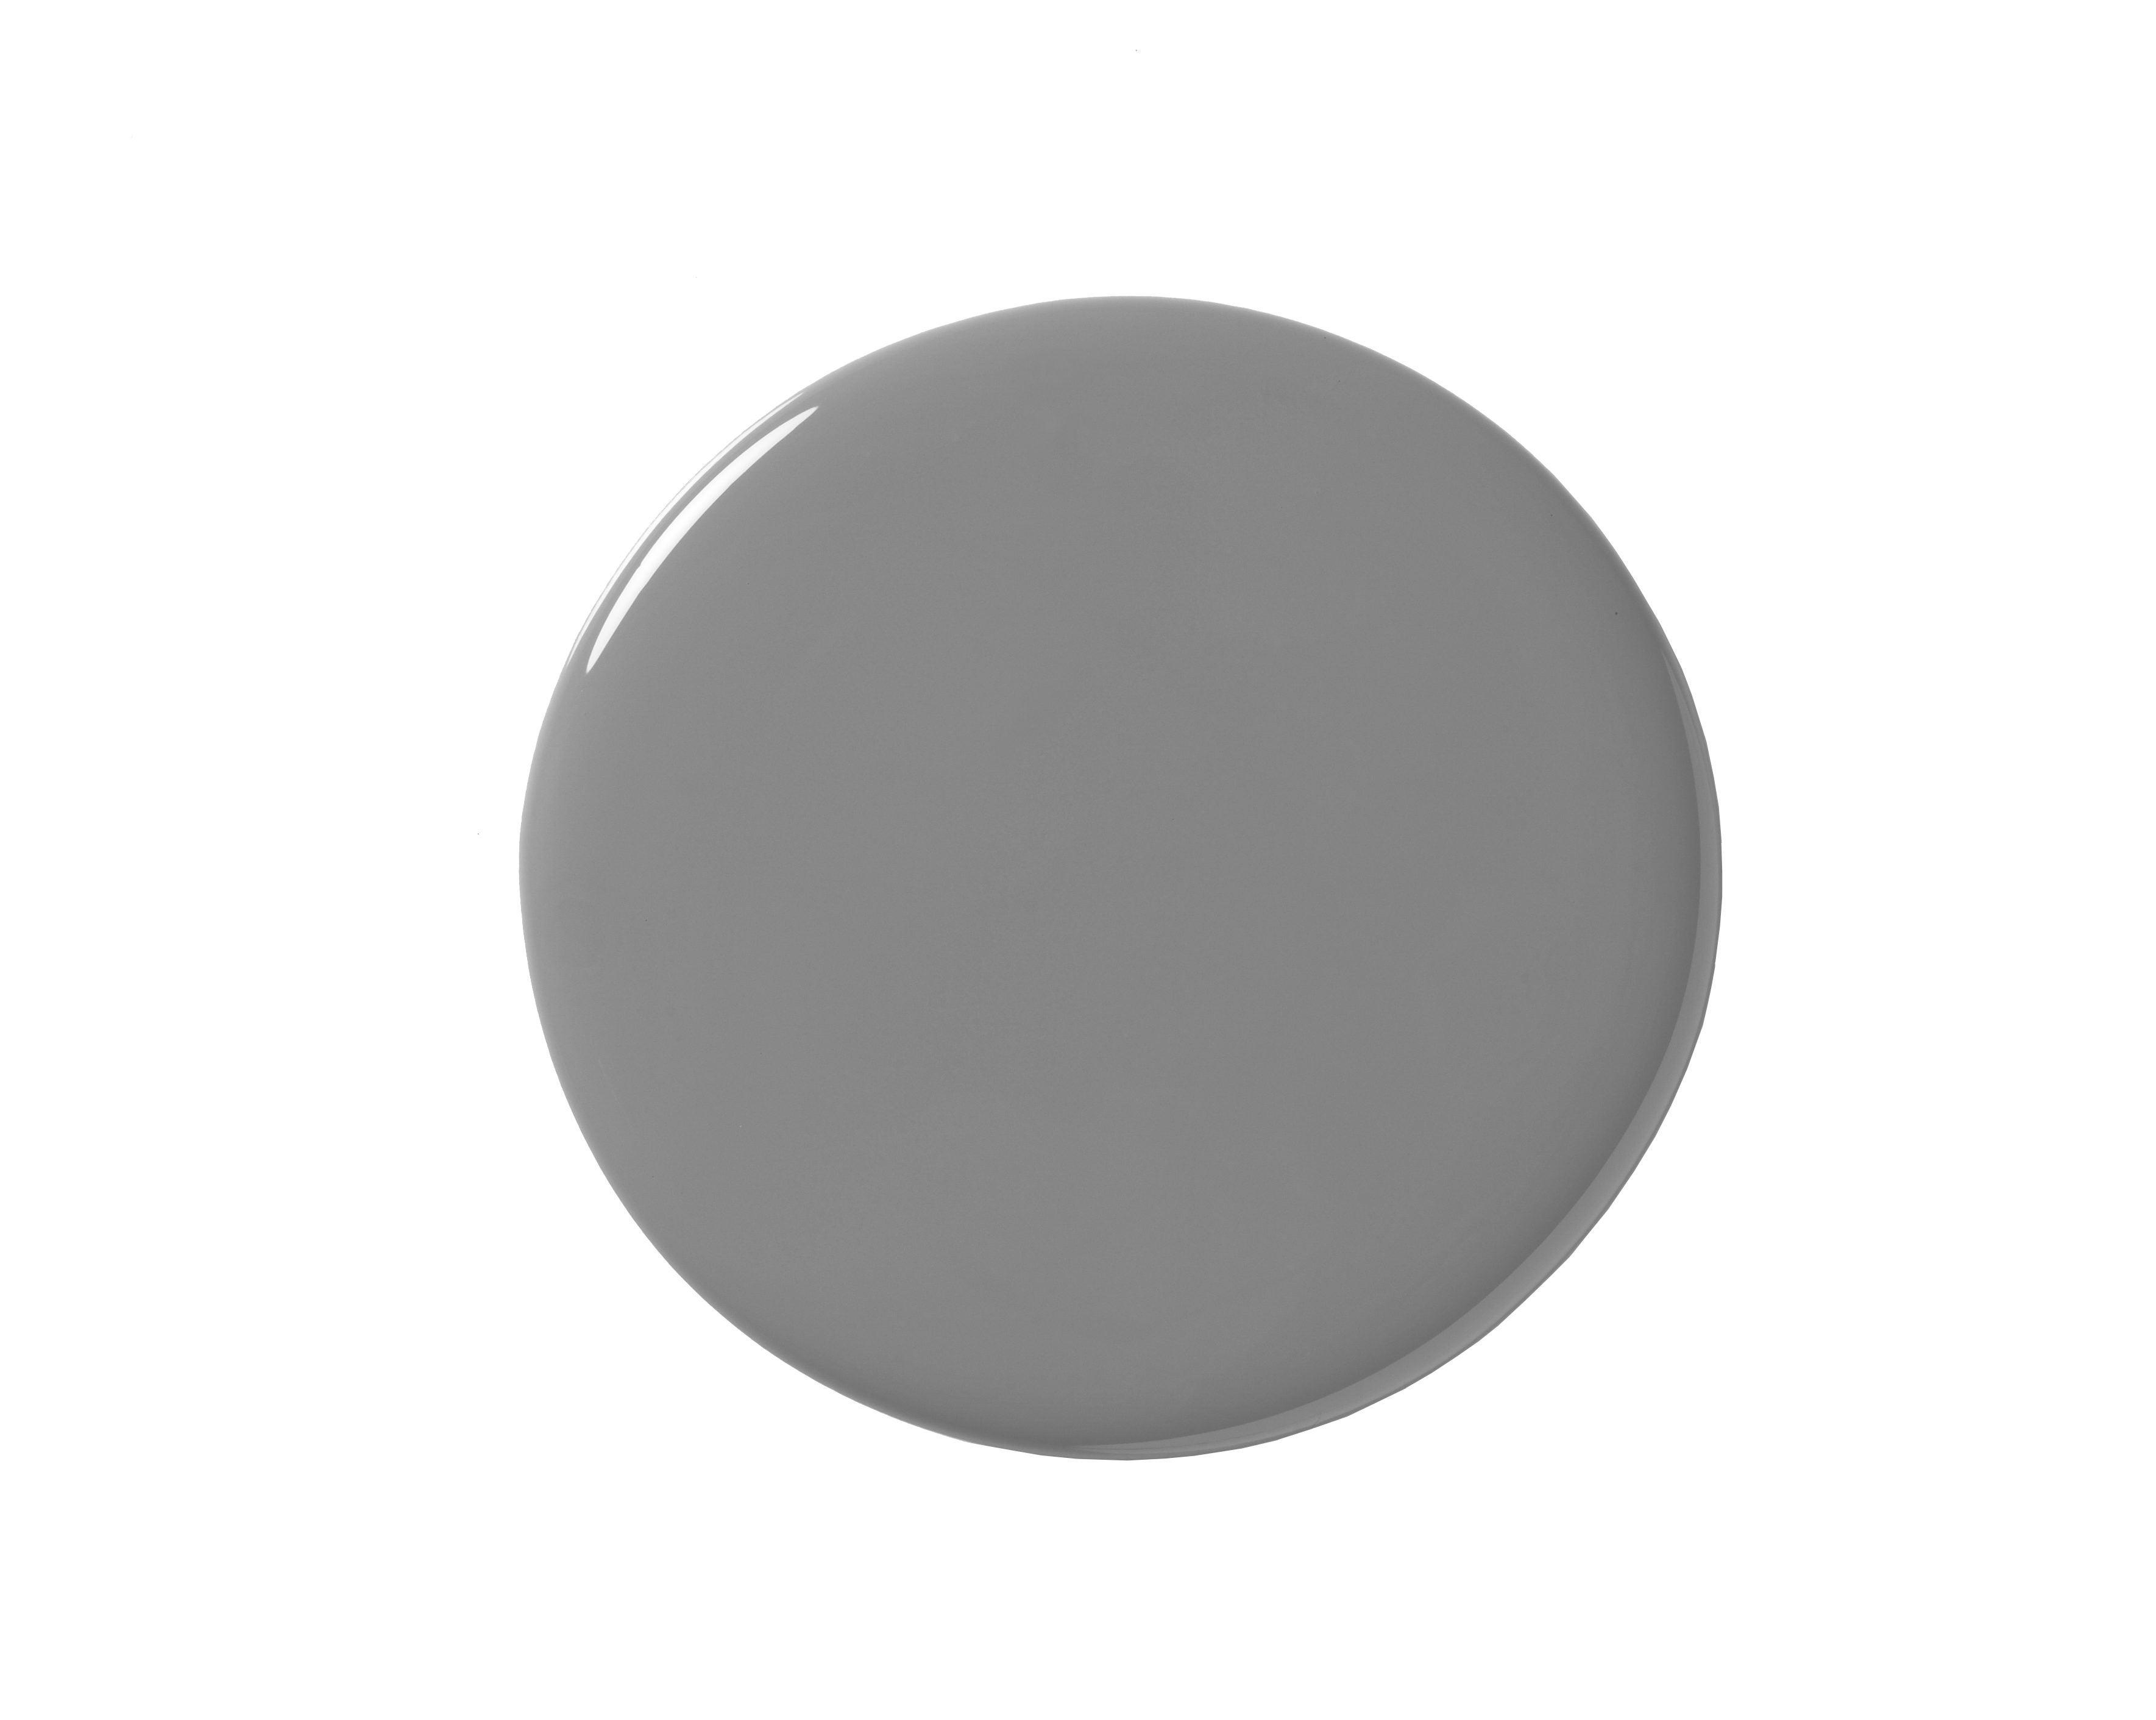 dark_gray_PAINT_BLOB_01